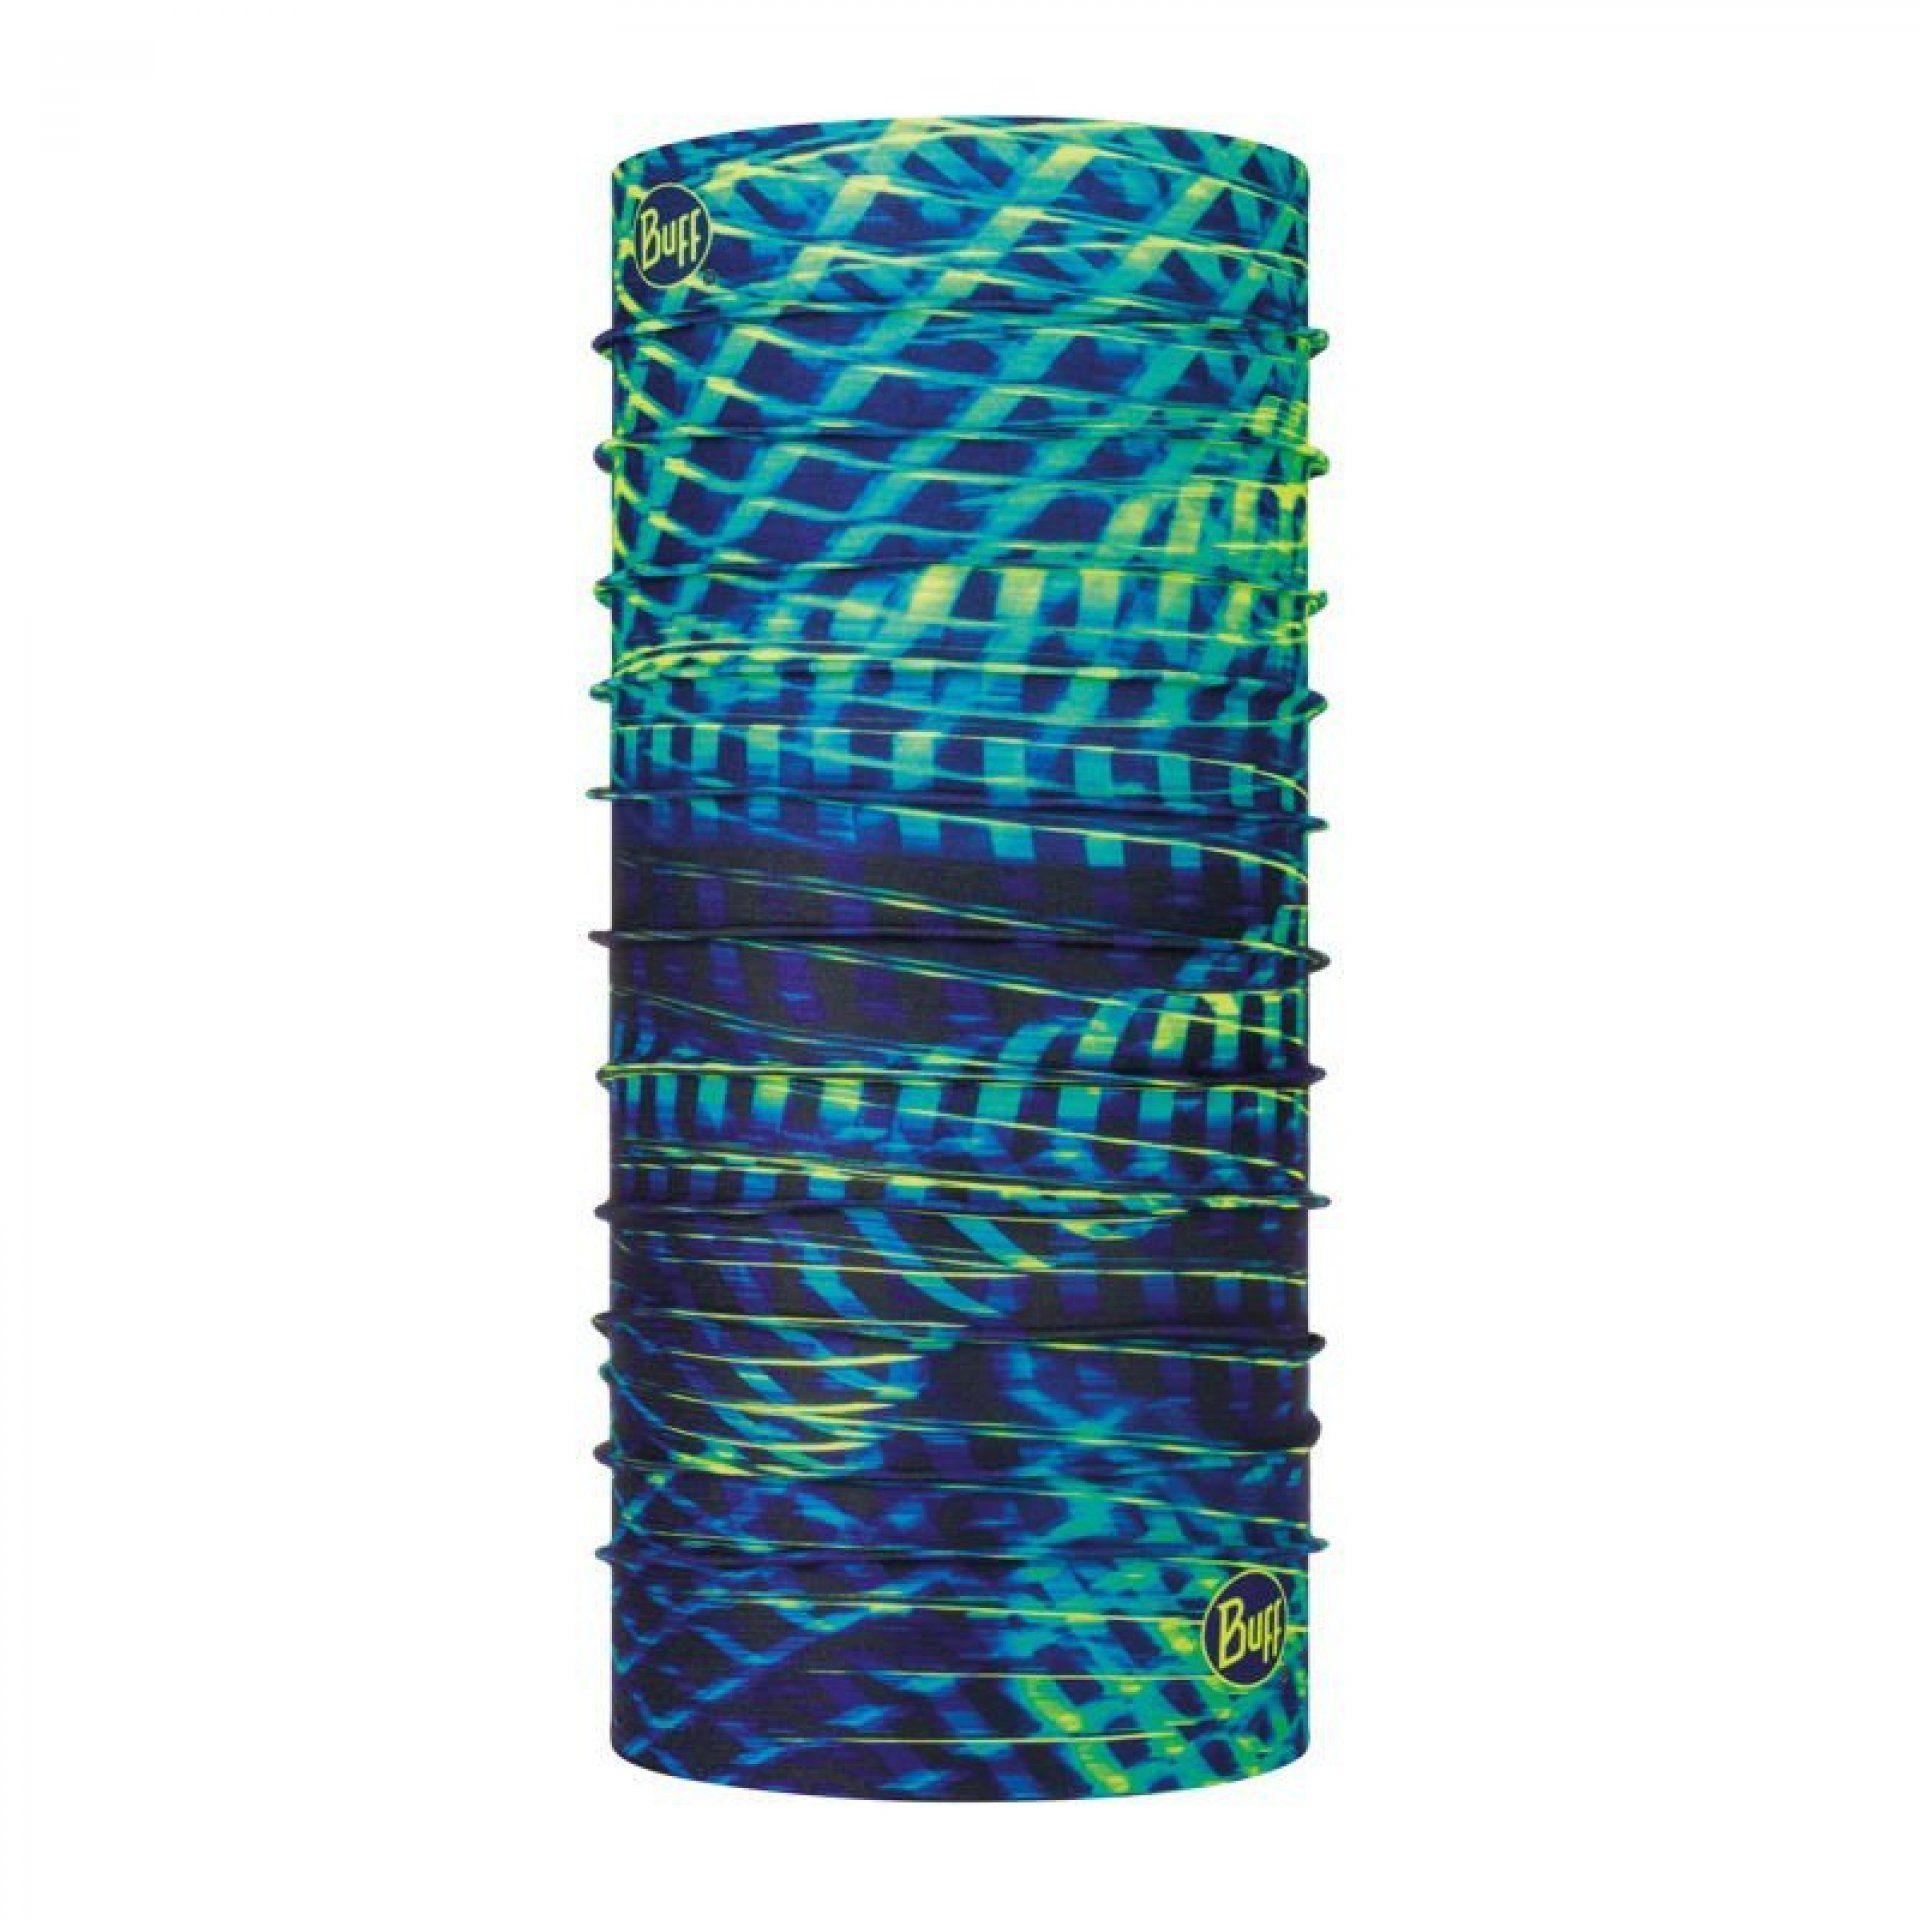 CHUSTA BUFF COOLNET UV+ SURAL MULTI